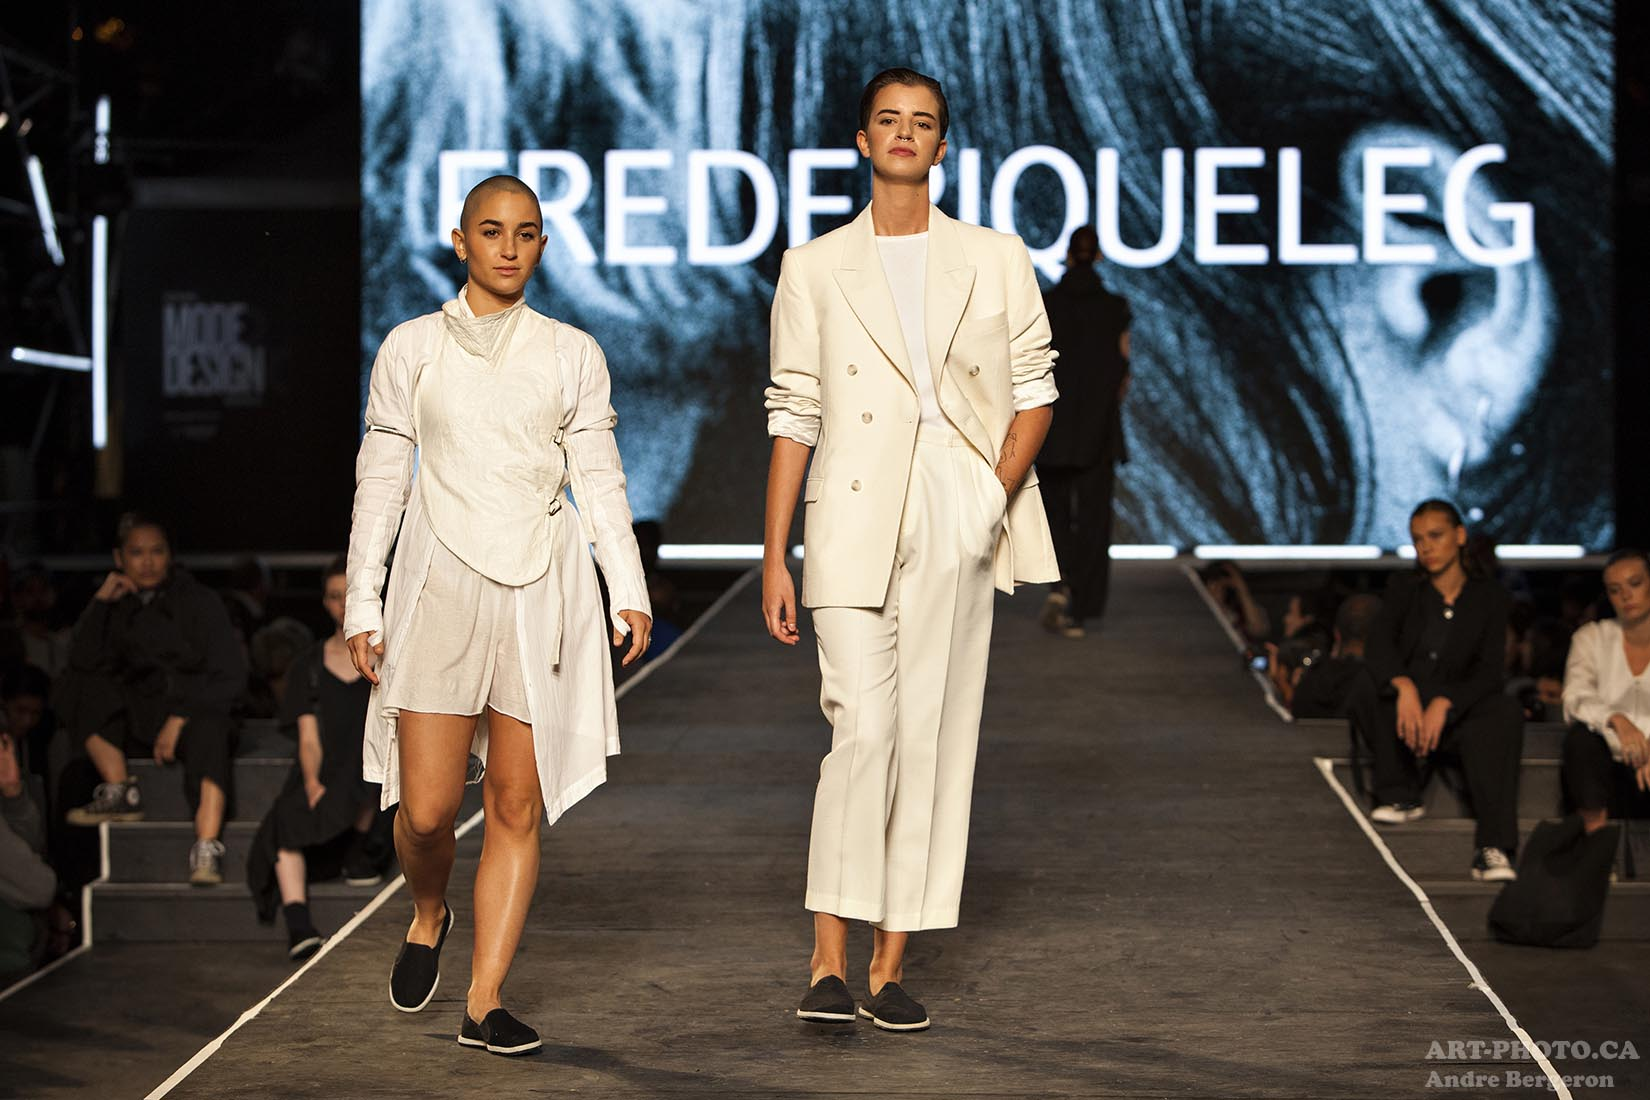 Festival Mode & Design 2017 - FREDERIQUELEG photo